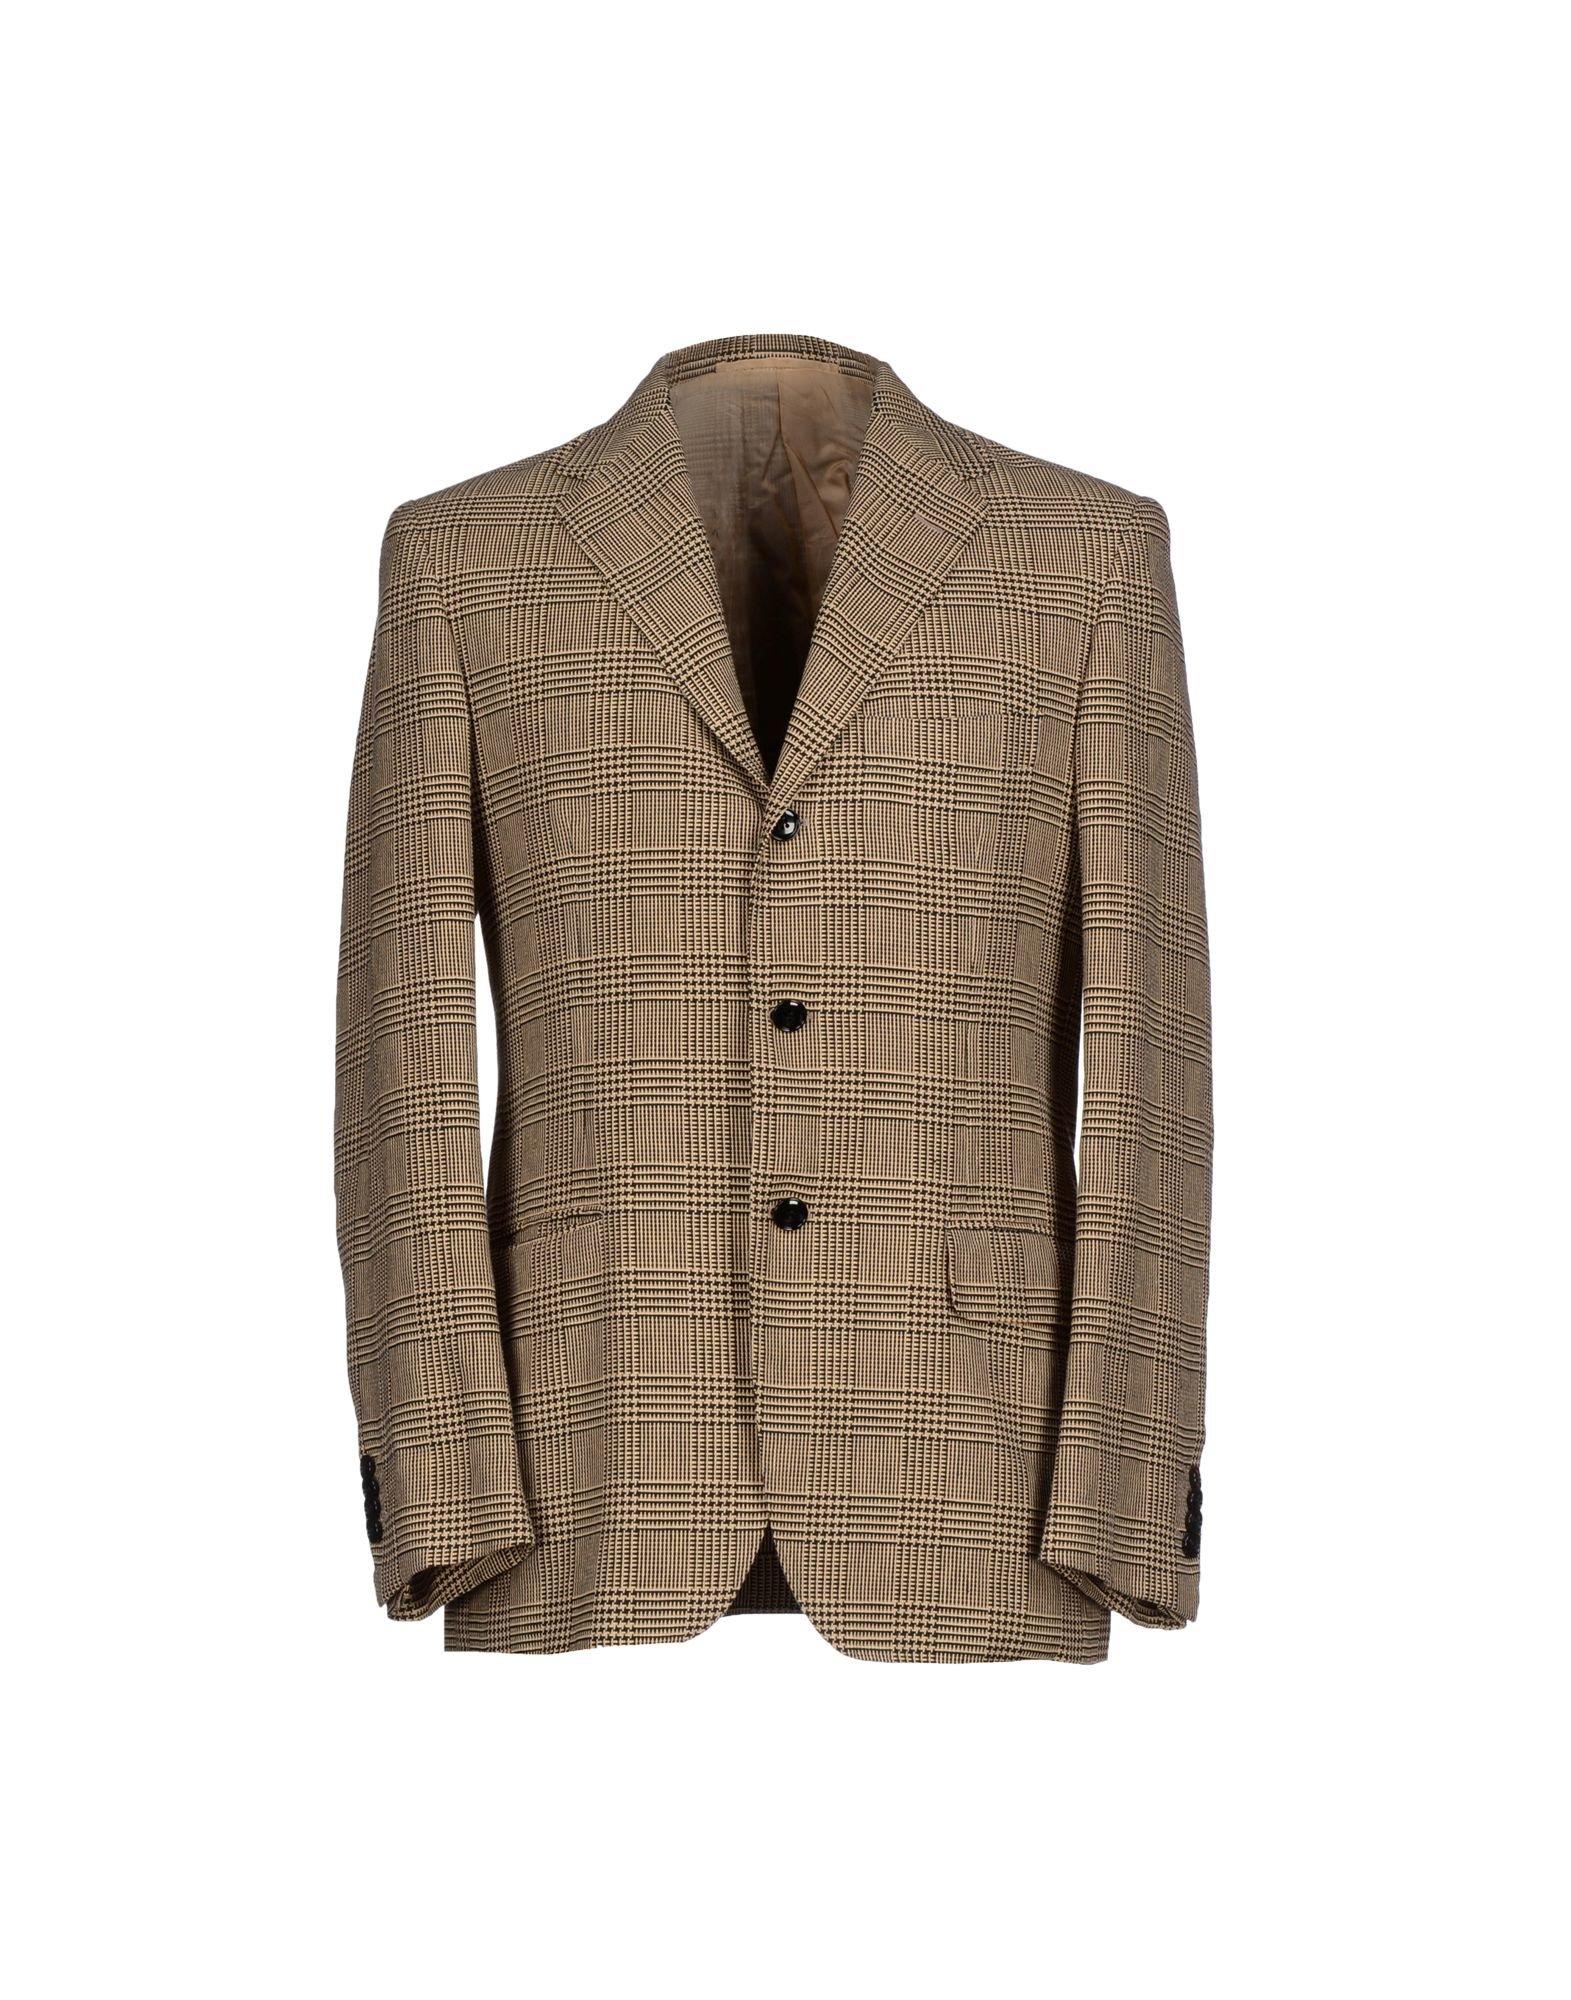 mp massimo piombo blazer in beige for men lyst. Black Bedroom Furniture Sets. Home Design Ideas